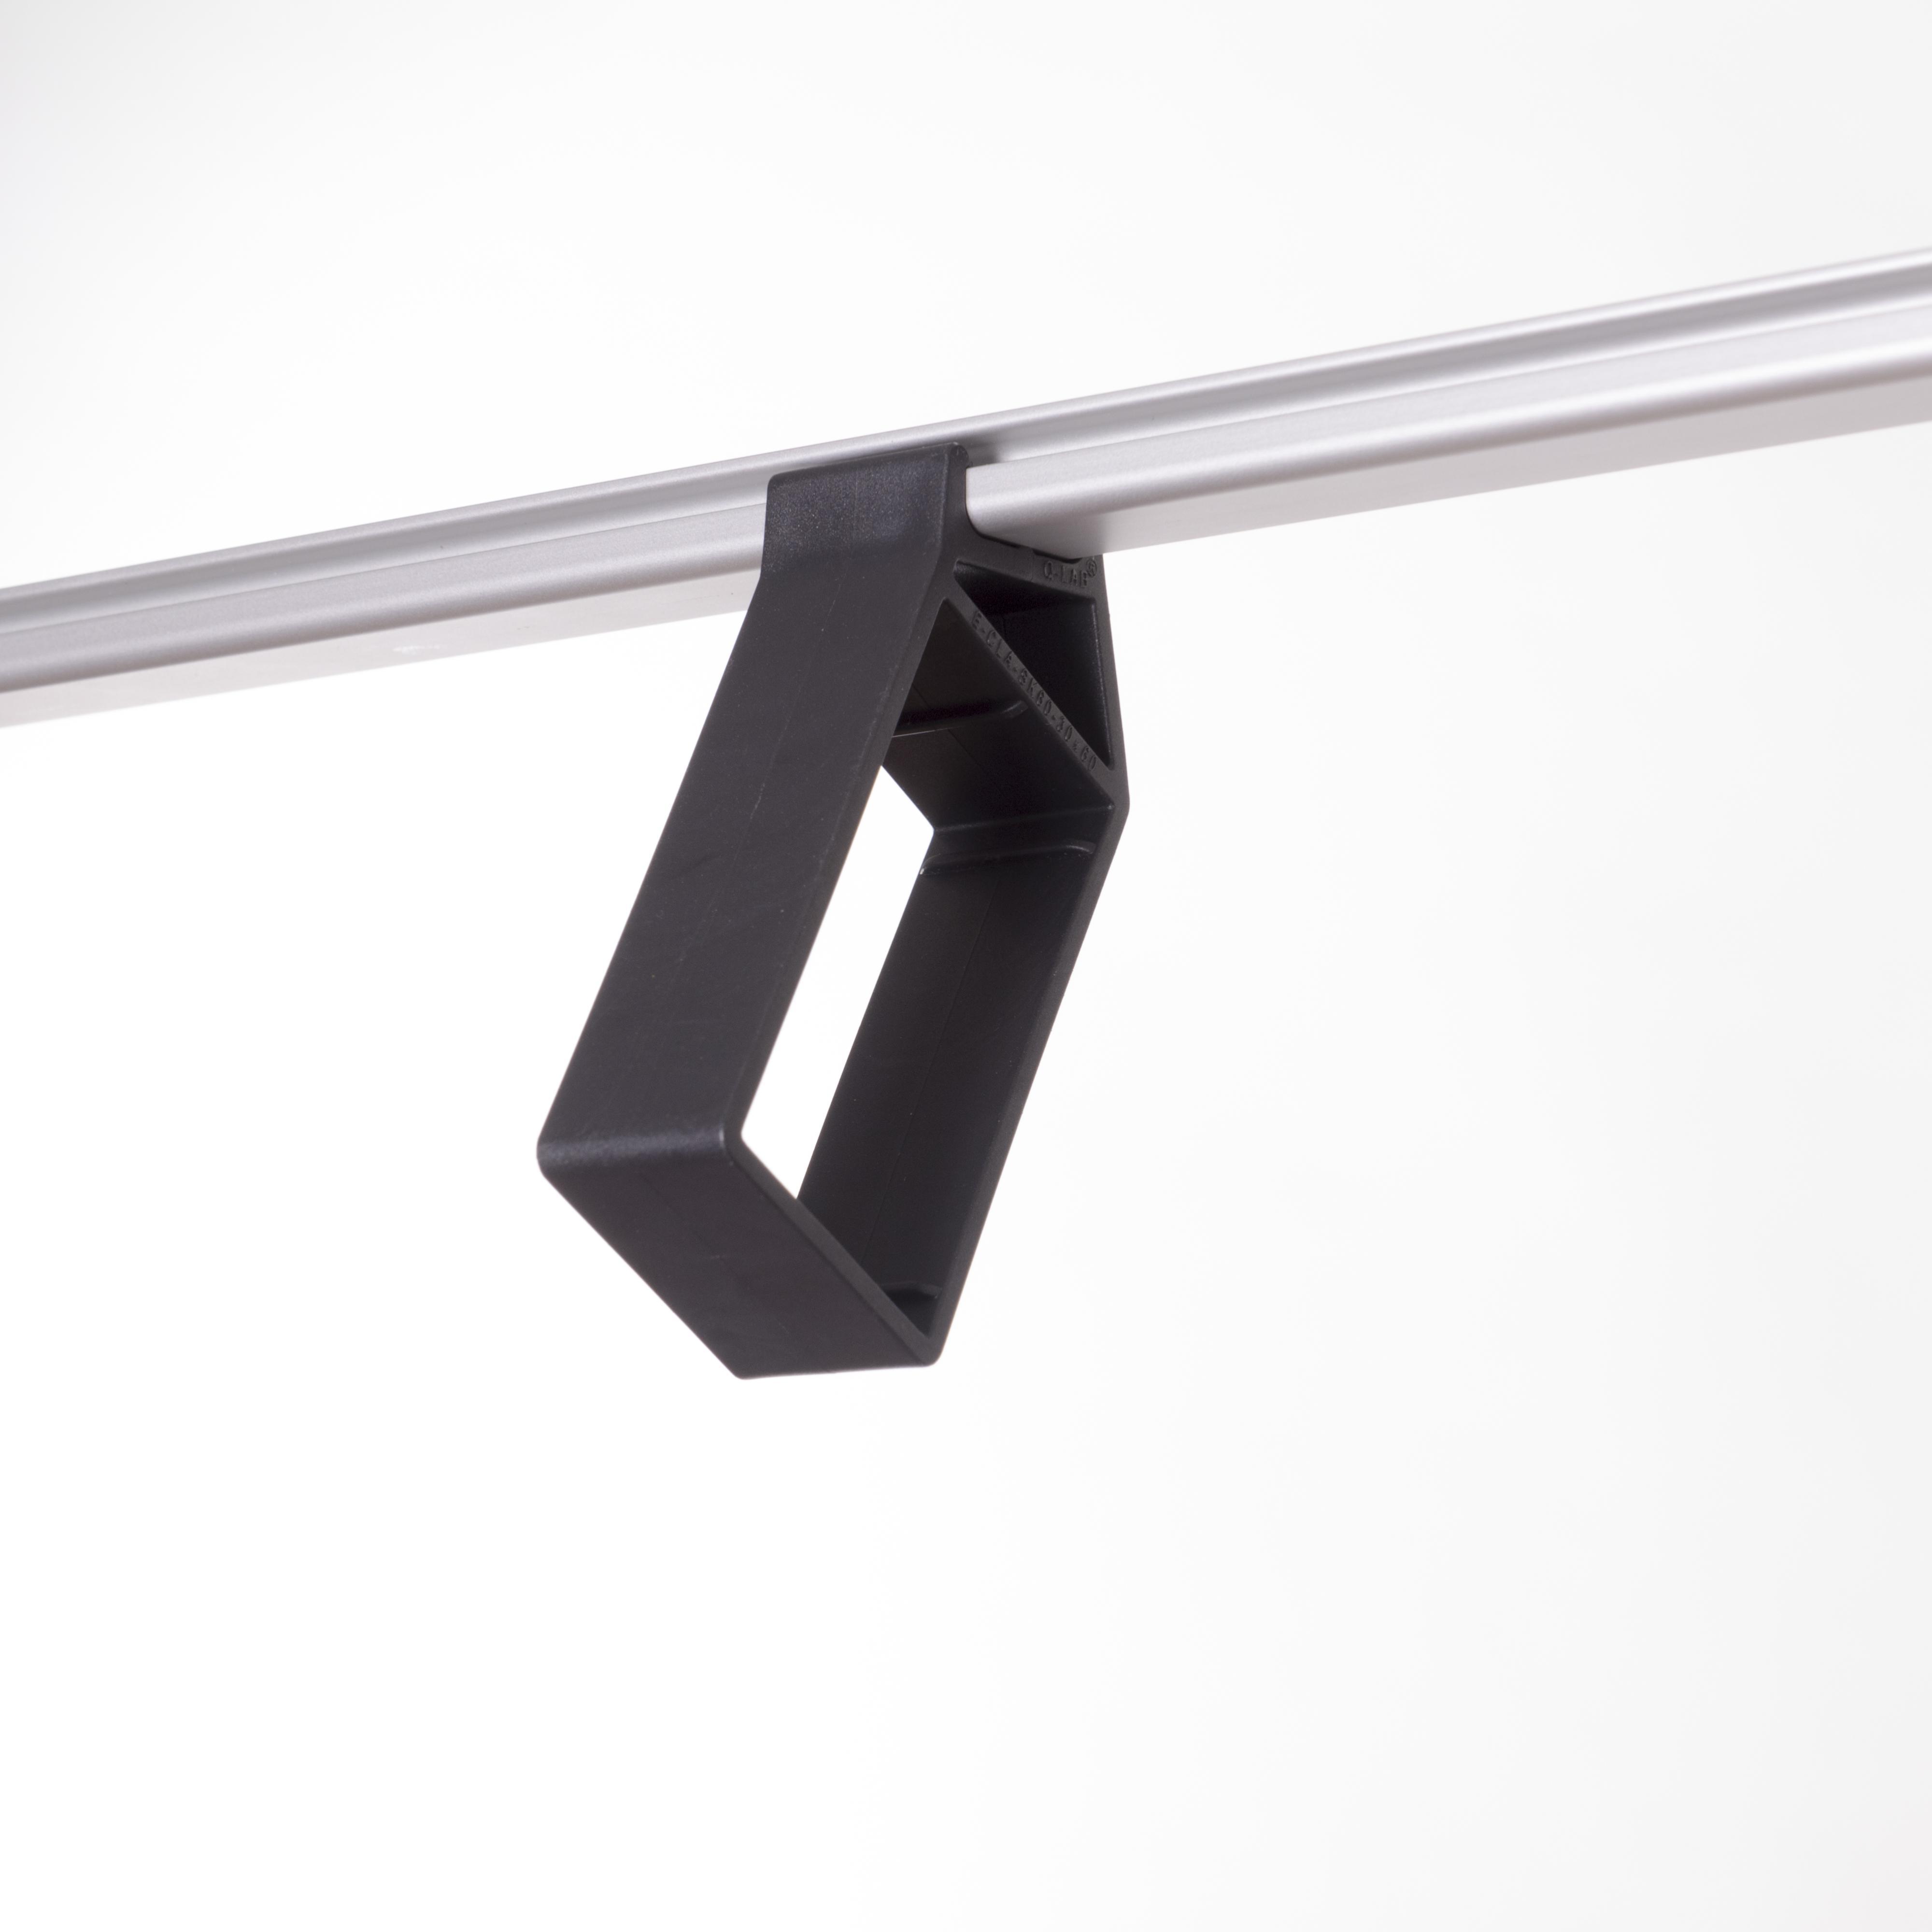 powerbar-clamp-2.jpg